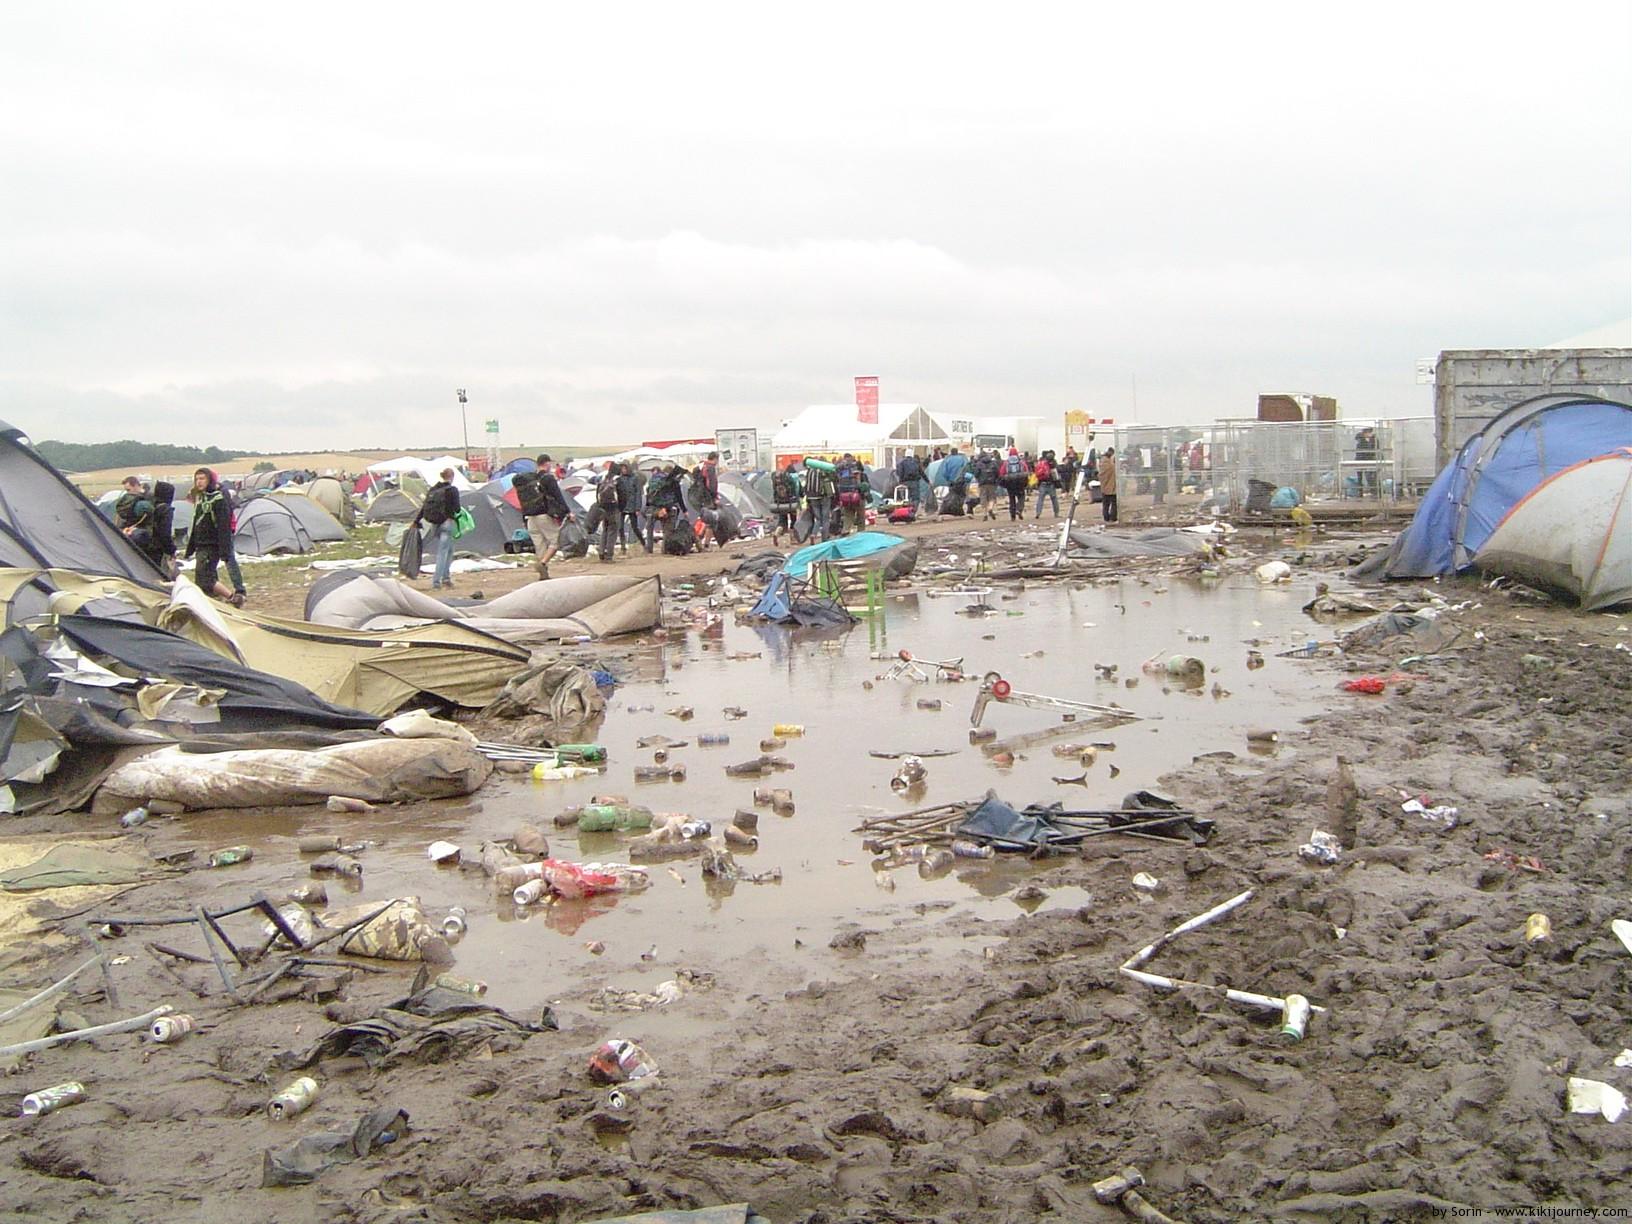 Nova Rock Festival - The Mud